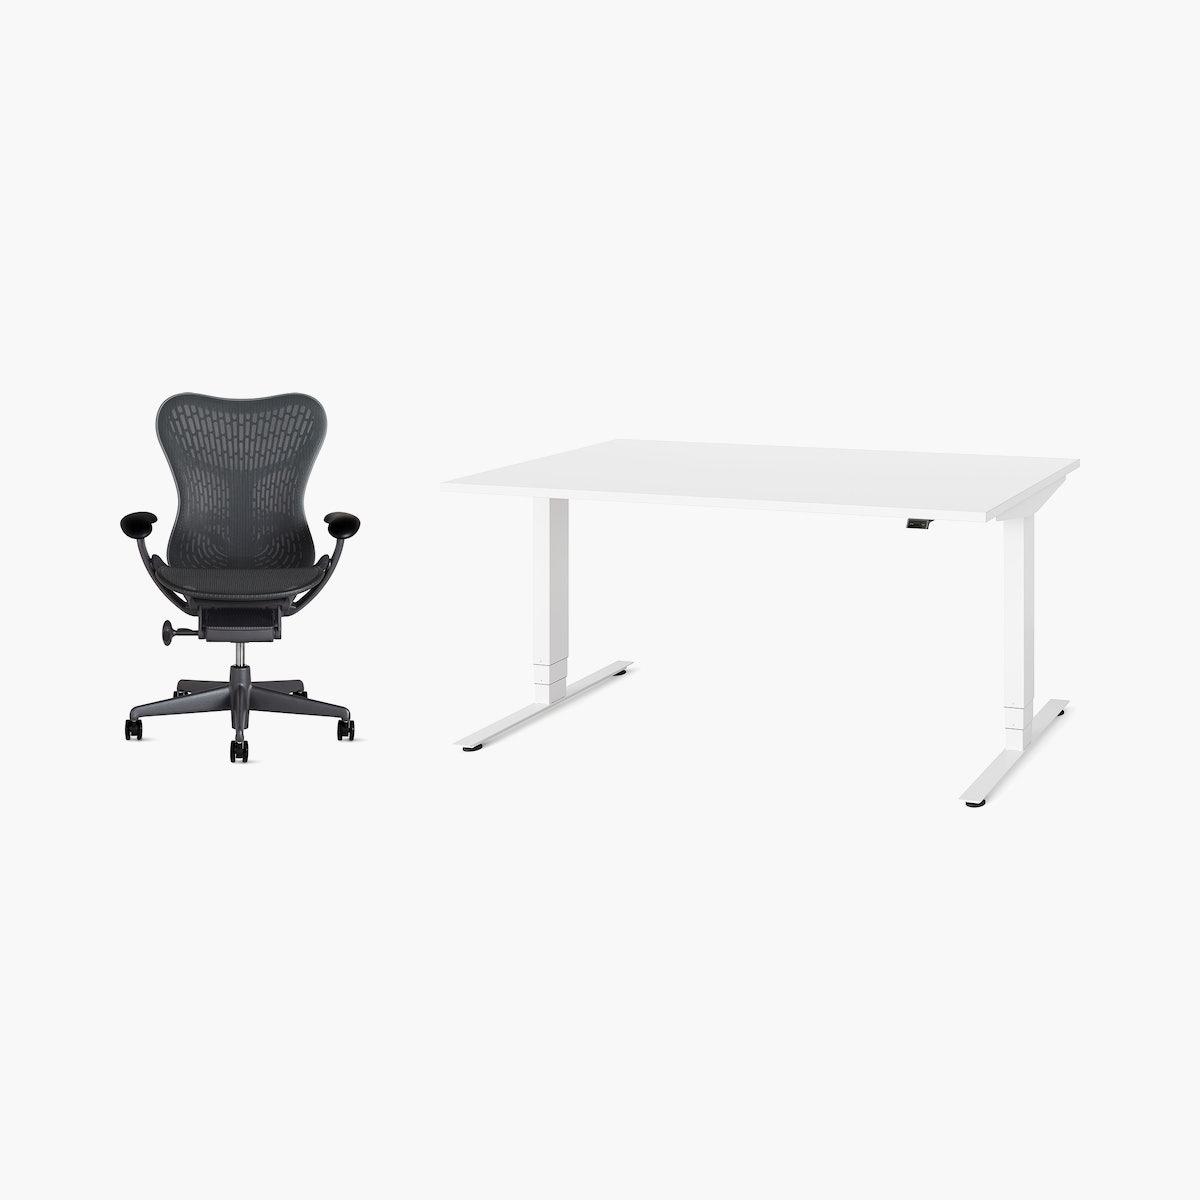 Mirra 2 / Nevi Sit-to-Stand Desk Office Bundle